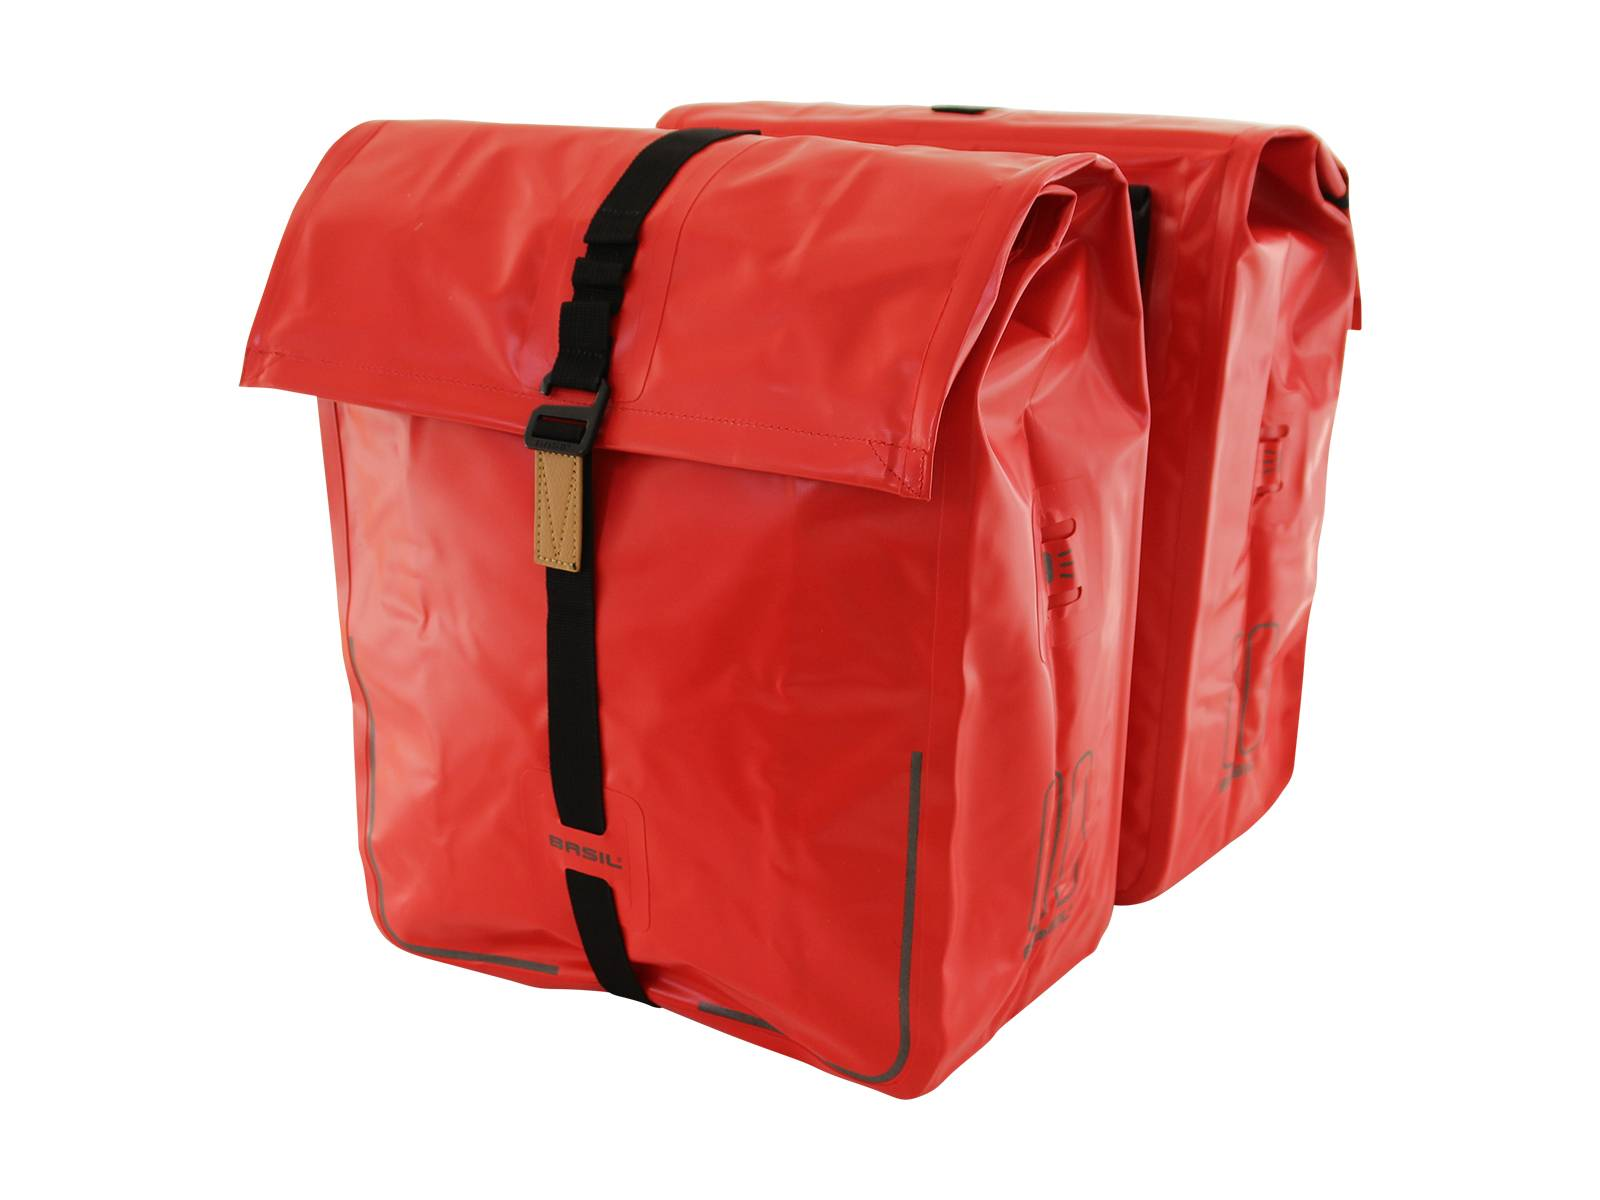 8107bb4d9ef Basil dubbele fietstas Urban Dry rood | Fietscomfort